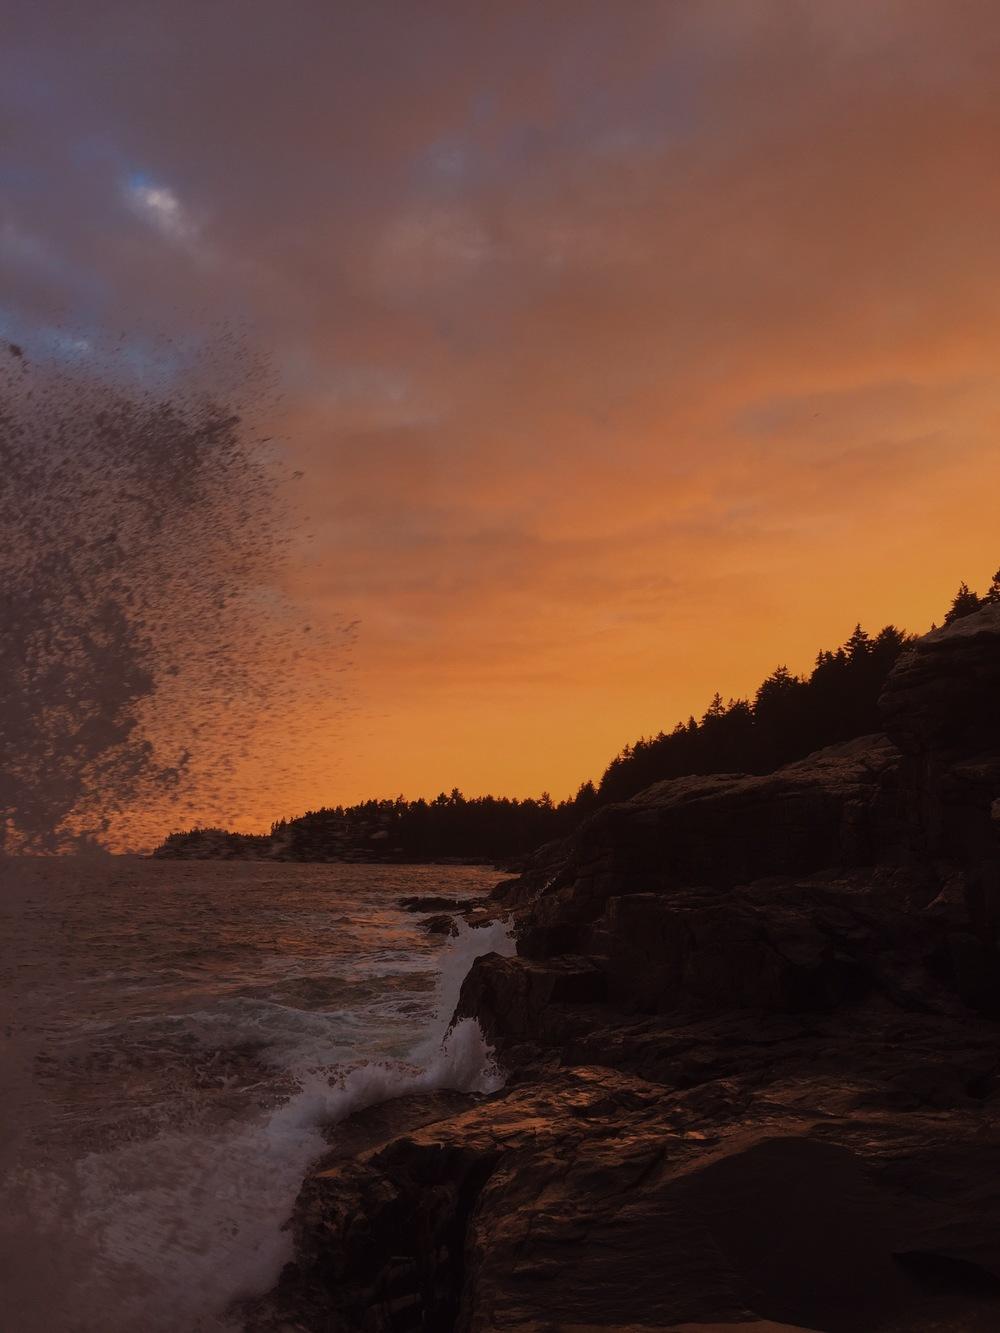 Sunlight Sea Rain, Cliff Kuhn-Lloyd